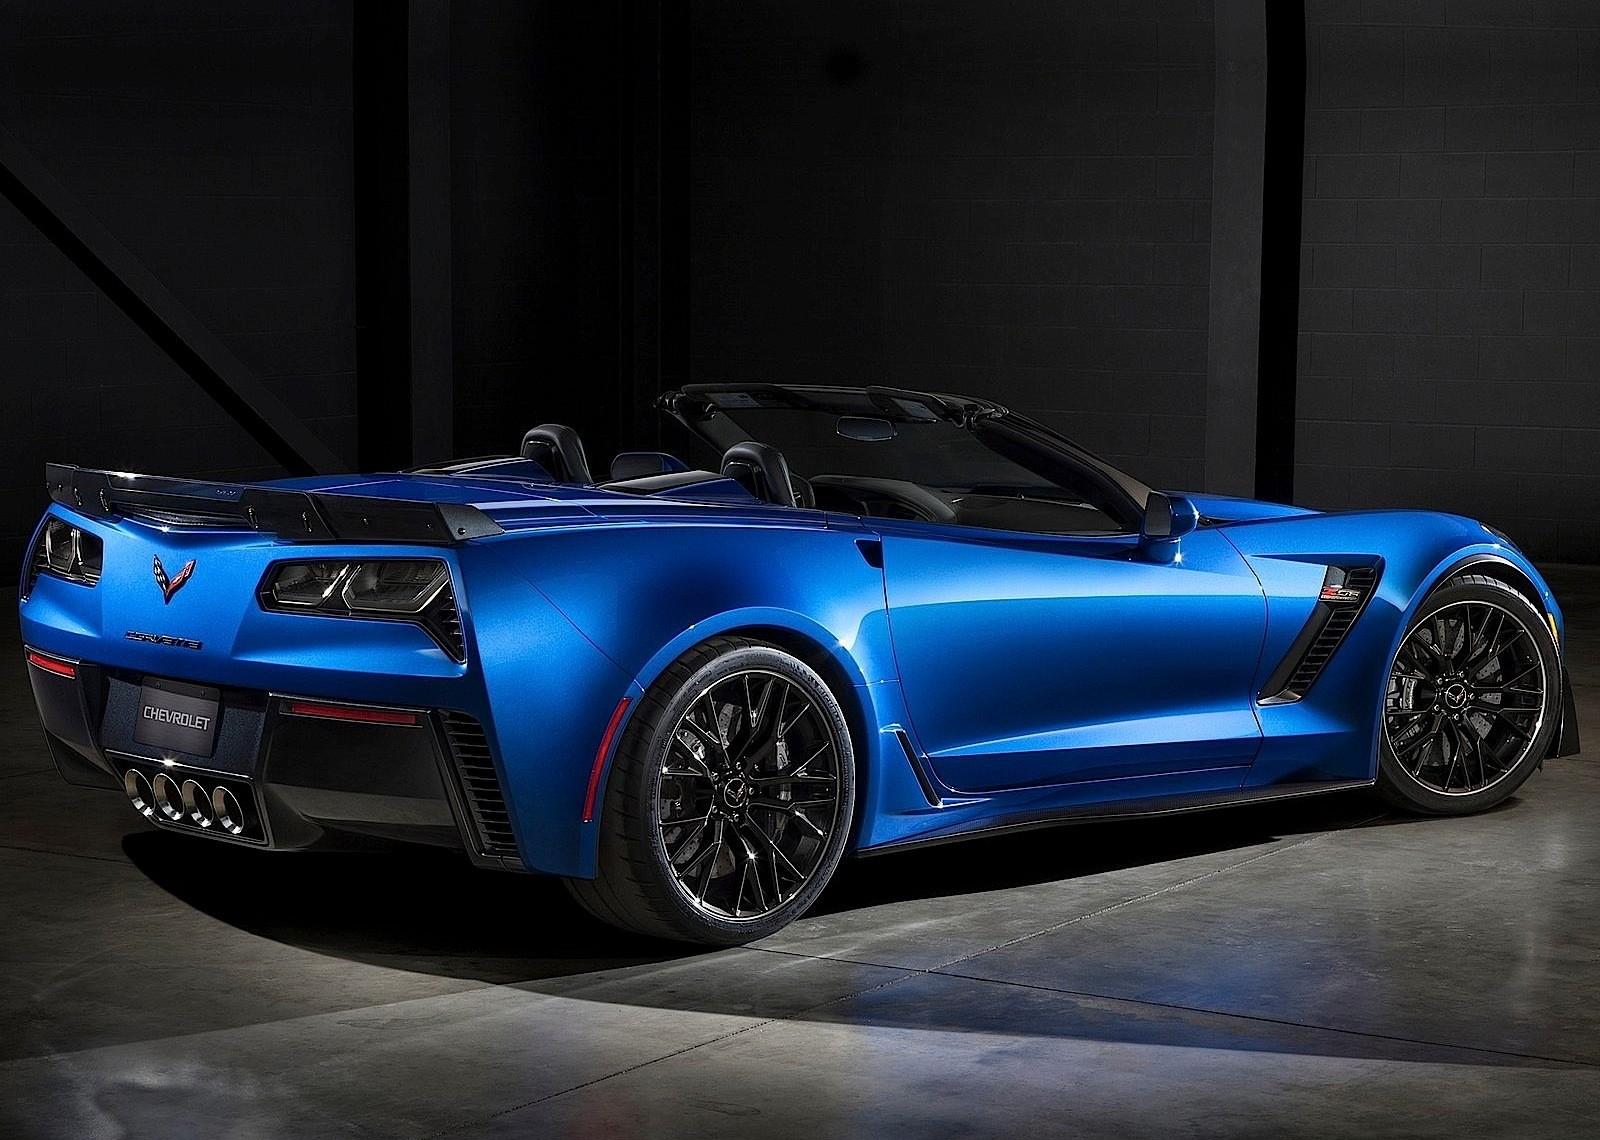 corvette z06 convertible chevrolet autoevolution specs release present